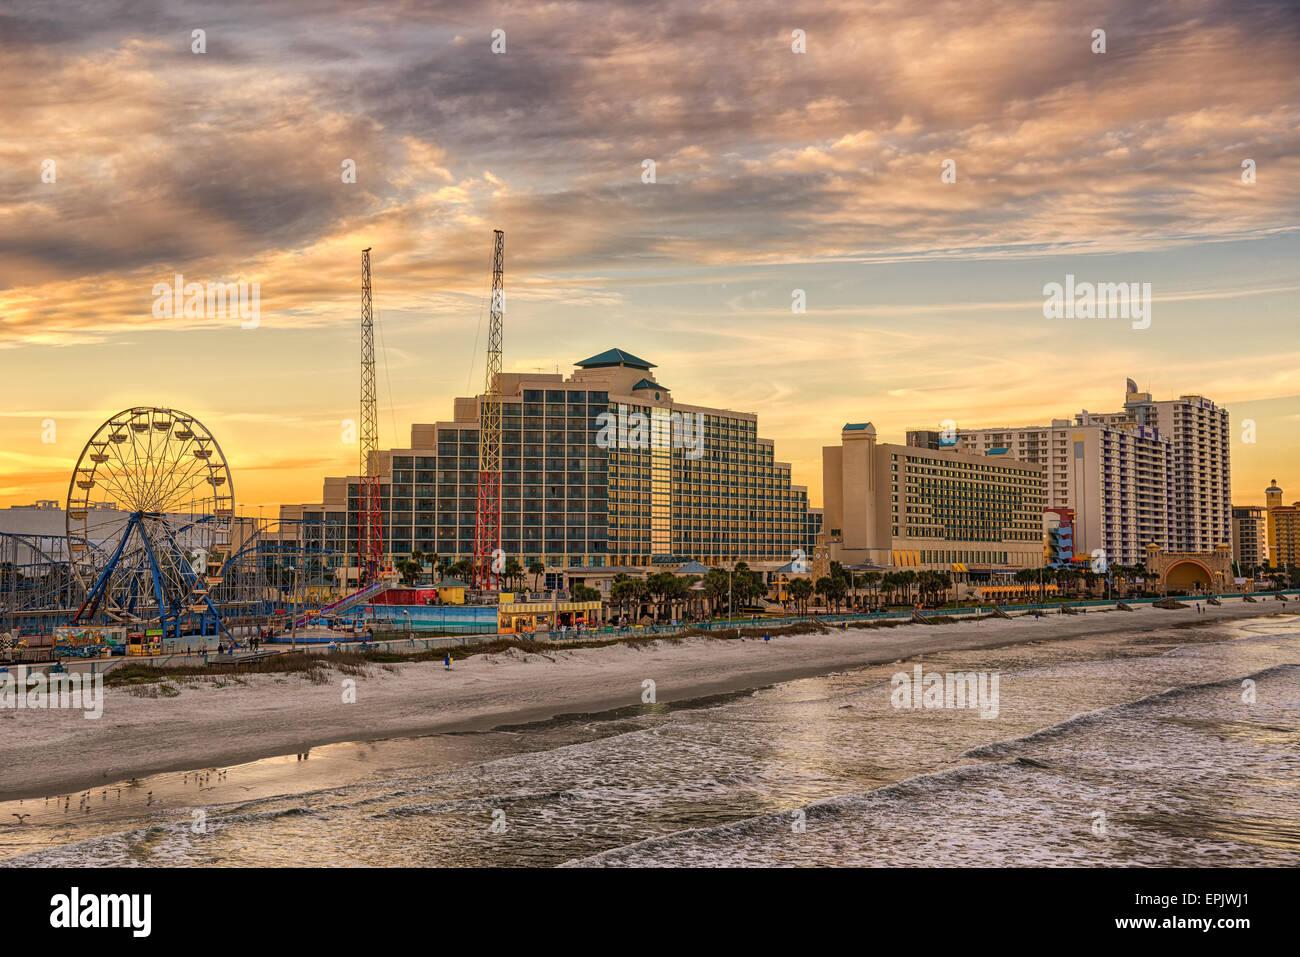 Skyline of Daytona Beach, Florida, at sunset from the fishing pier. - Stock Image